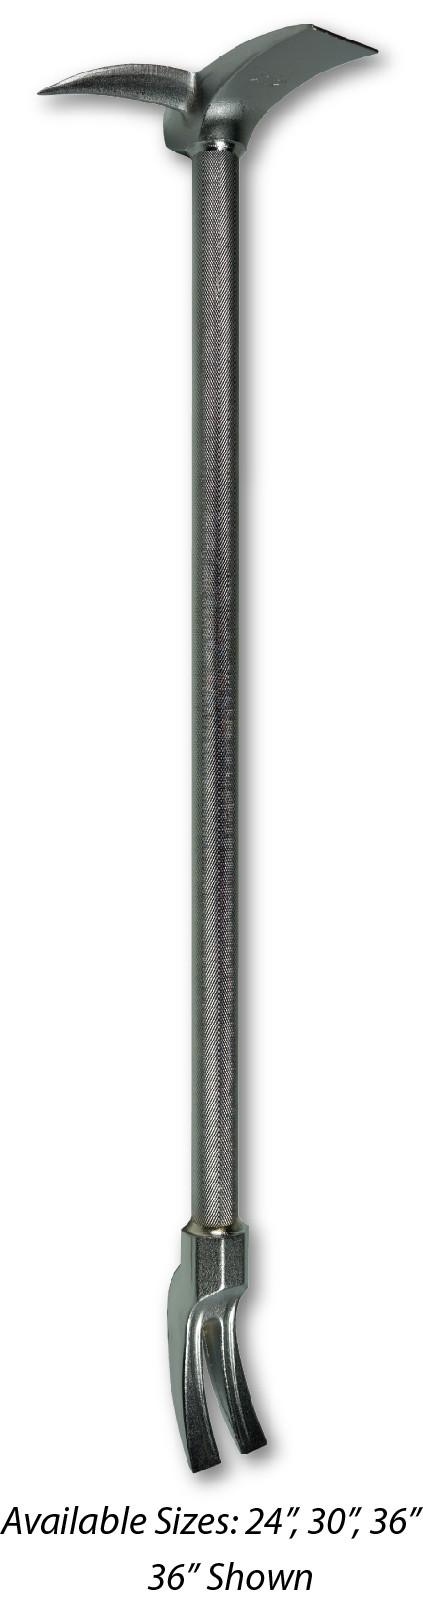 "NEW! ZT302-36 Alloy Entry Tool - Nickel 36"""